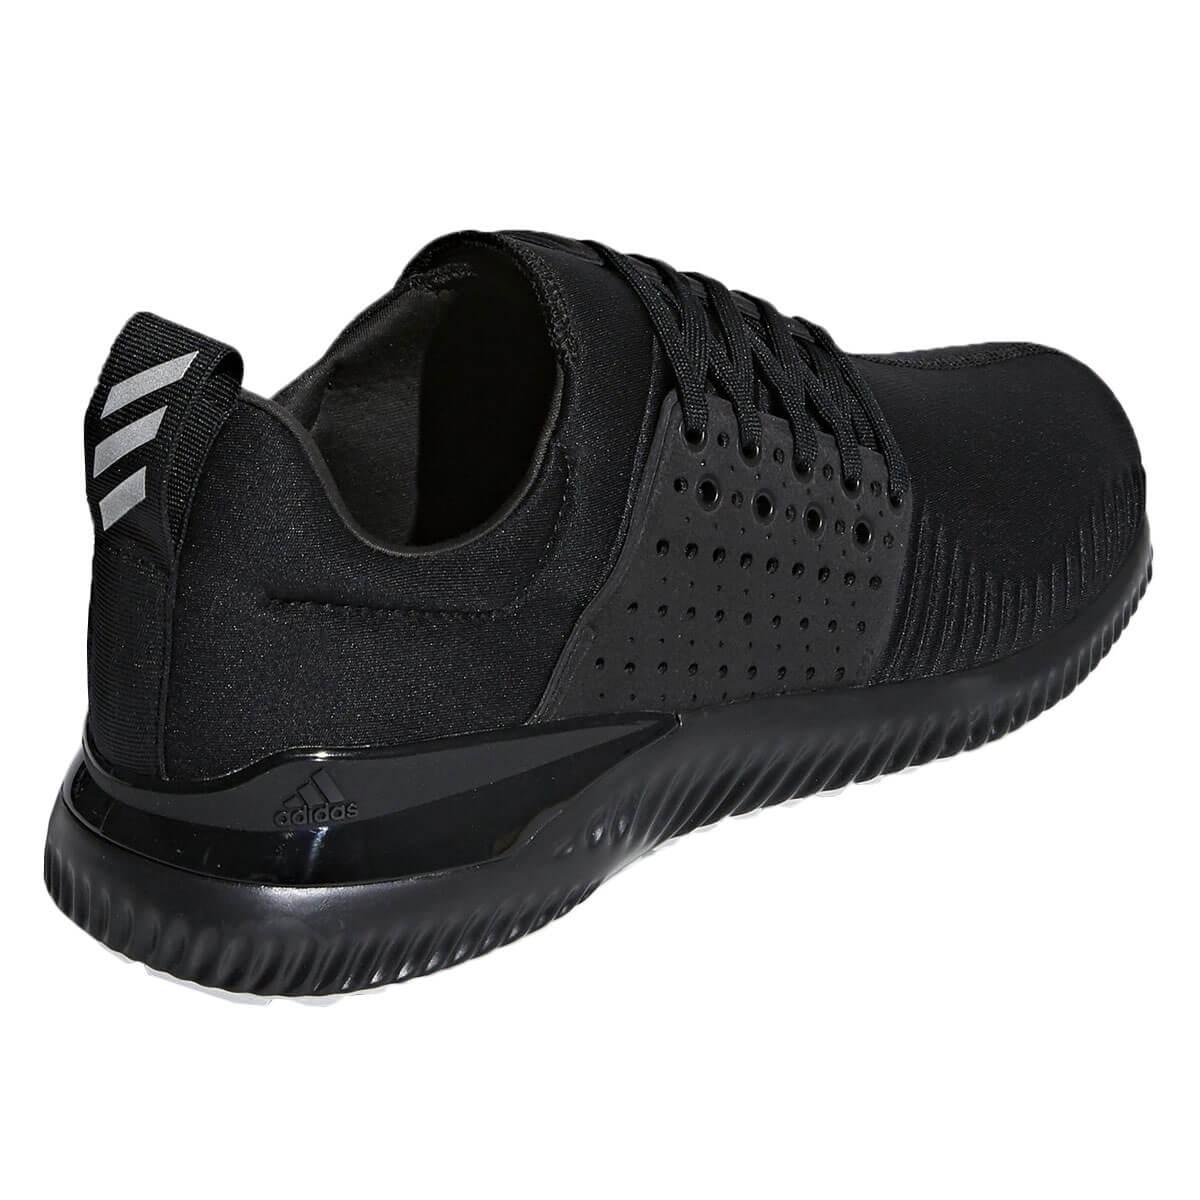 buy online e4146 ee8d9 Adidas-Golf-Men-039-s-2019-Adicross-Bounce-